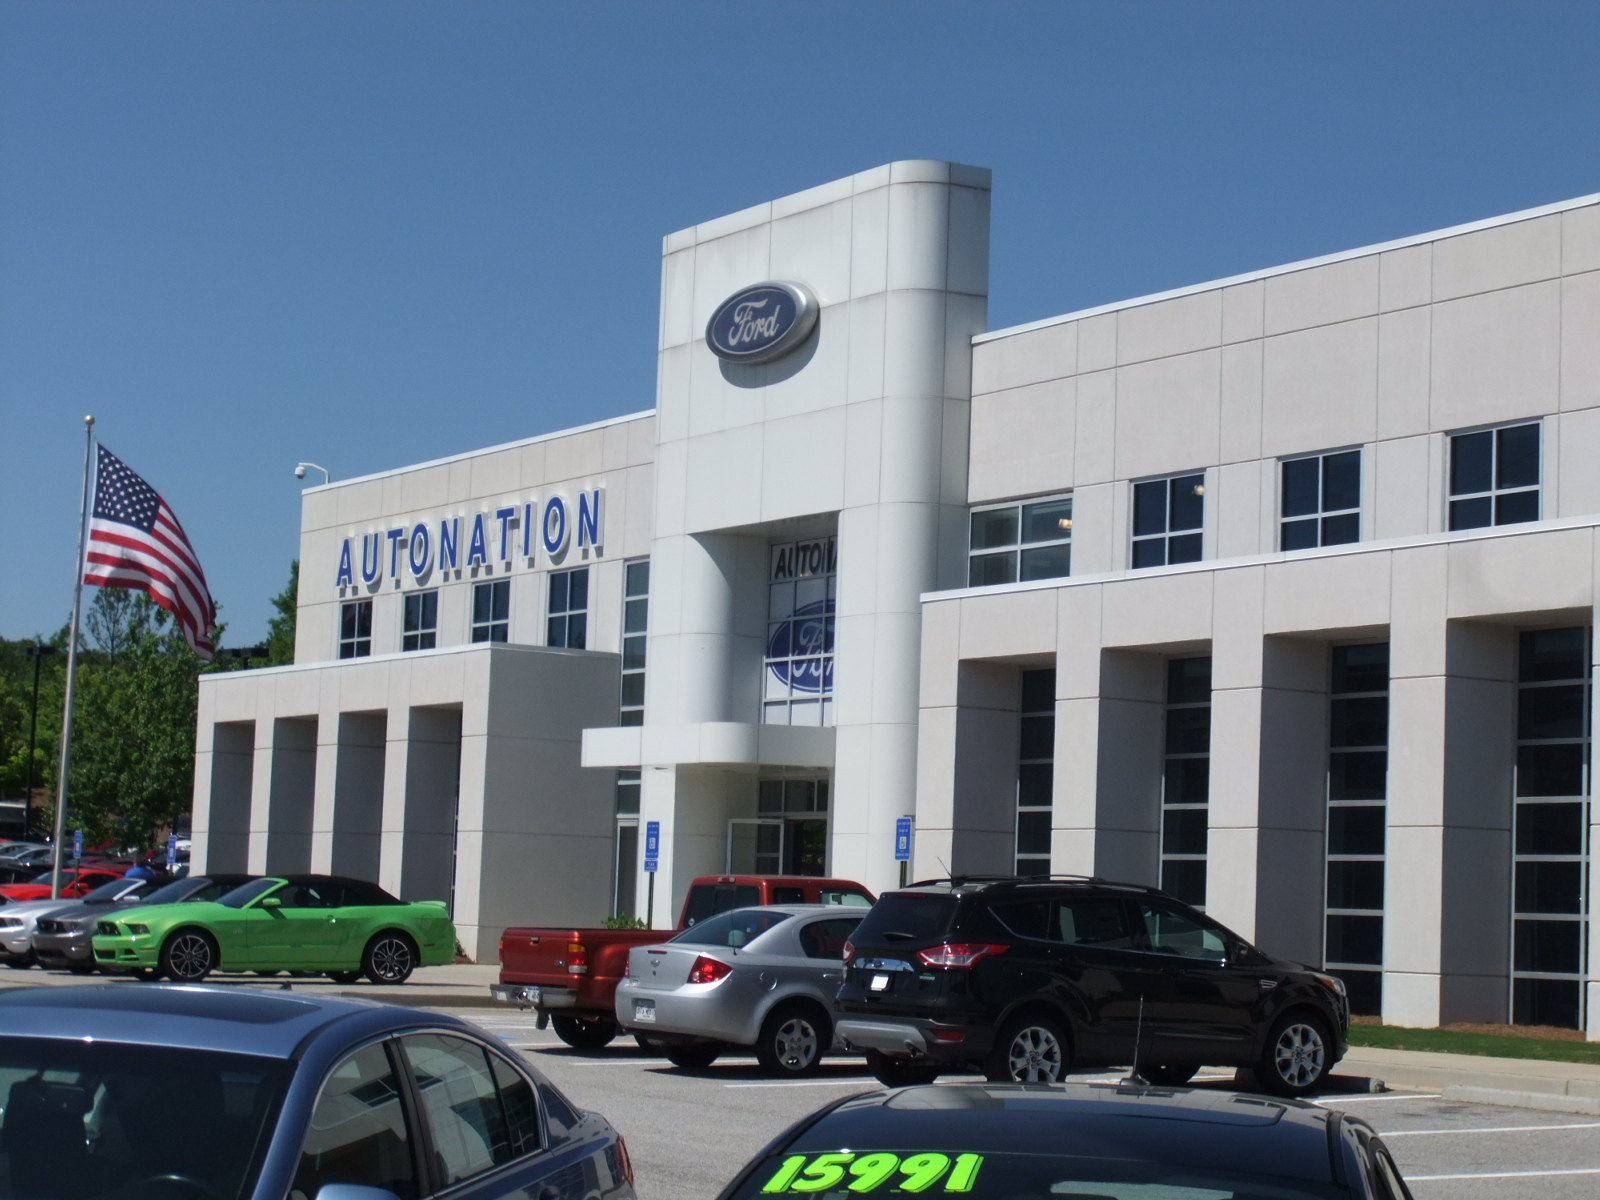 Autonation Ford Marietta In Marietta Ga Whitepages